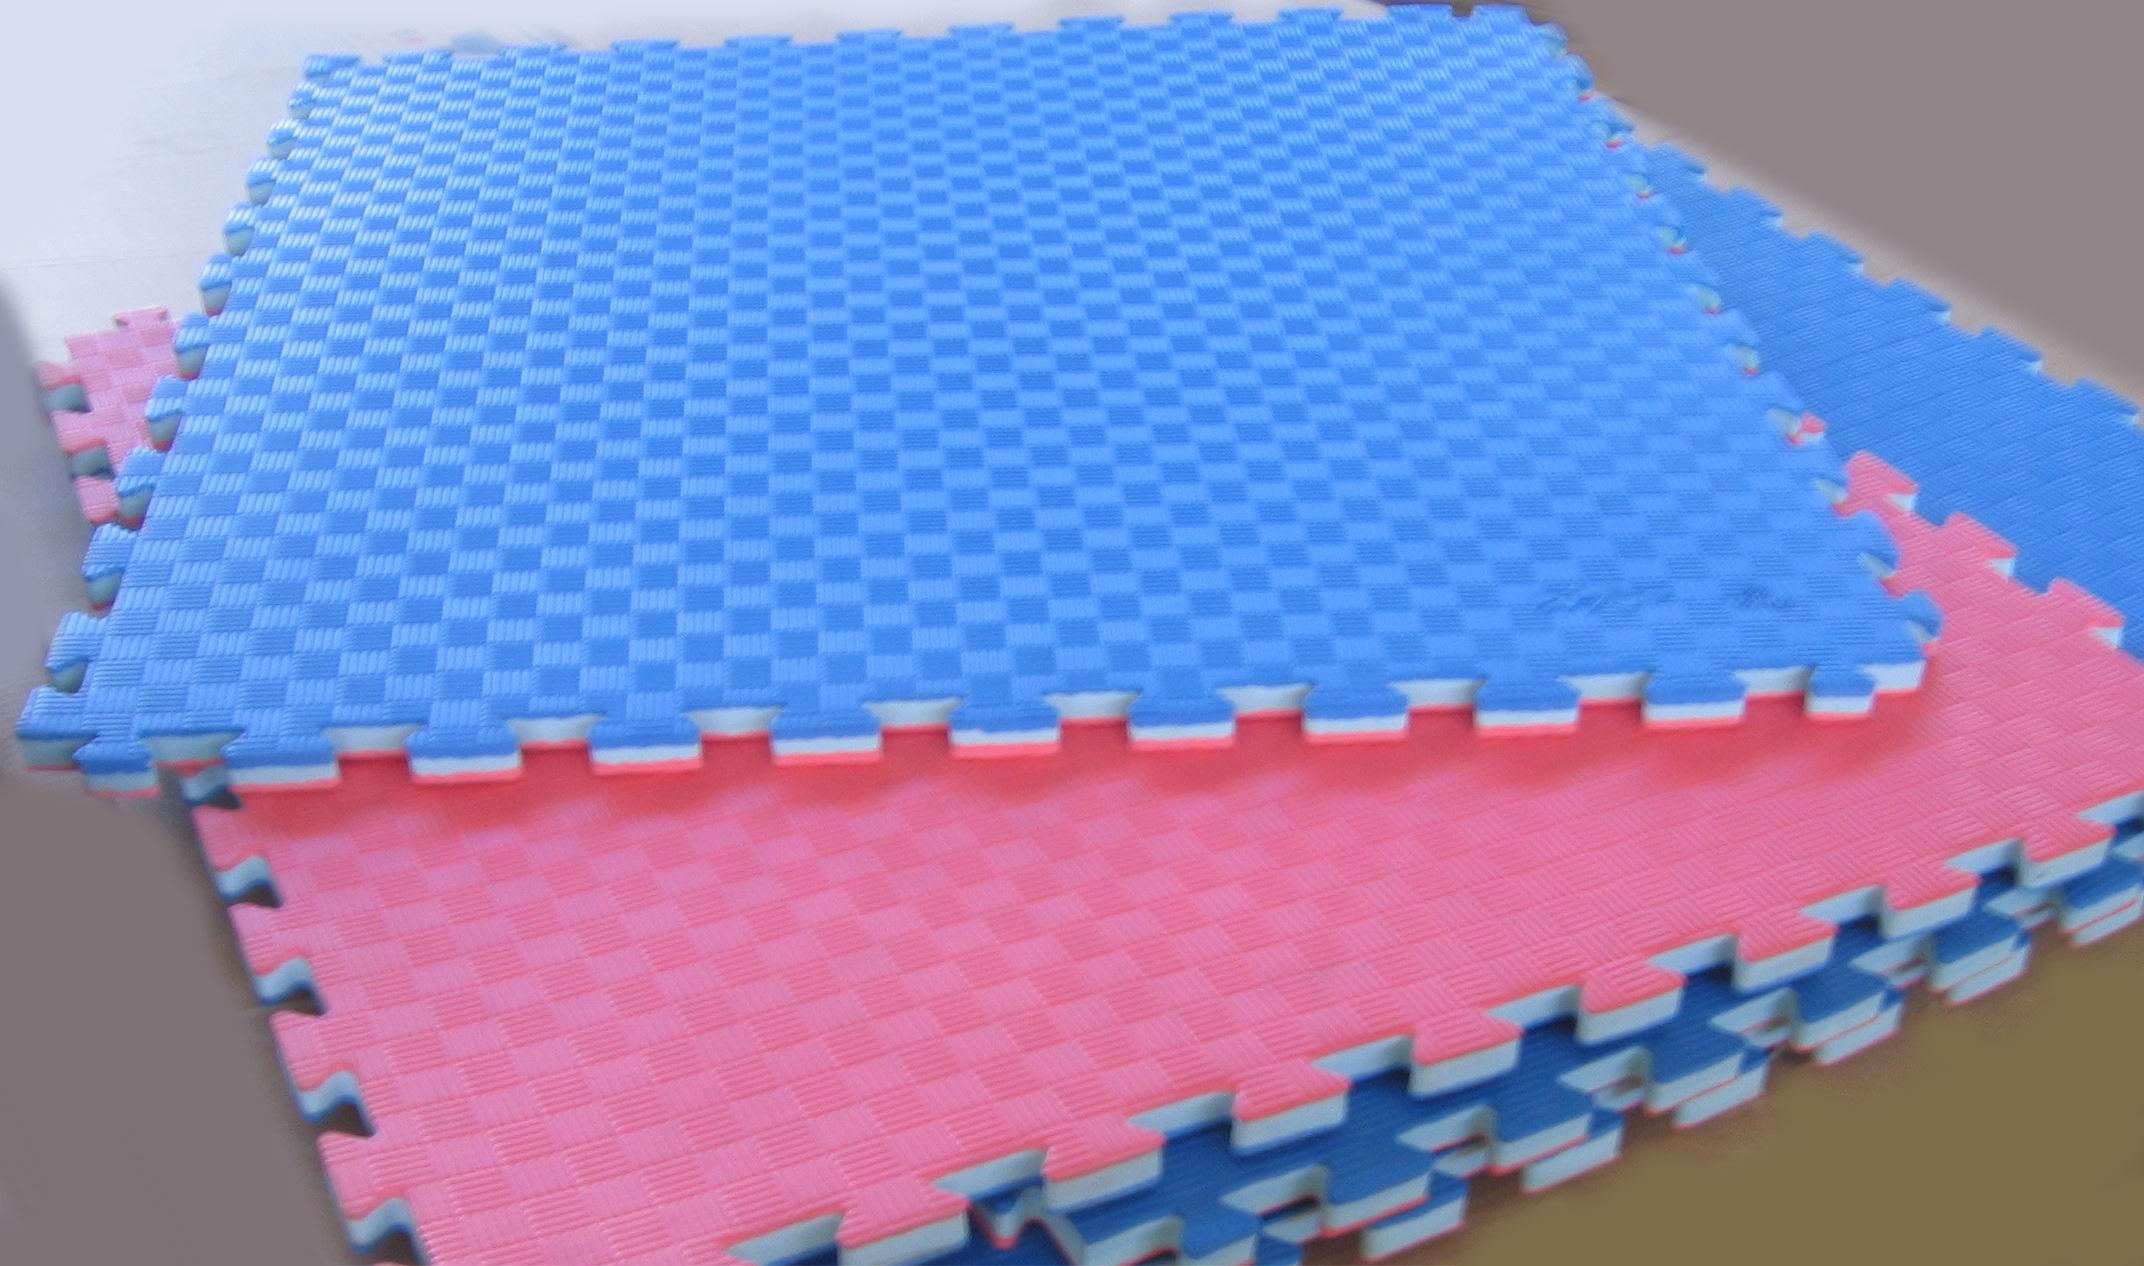 mats mat zebra product puzzle athletics